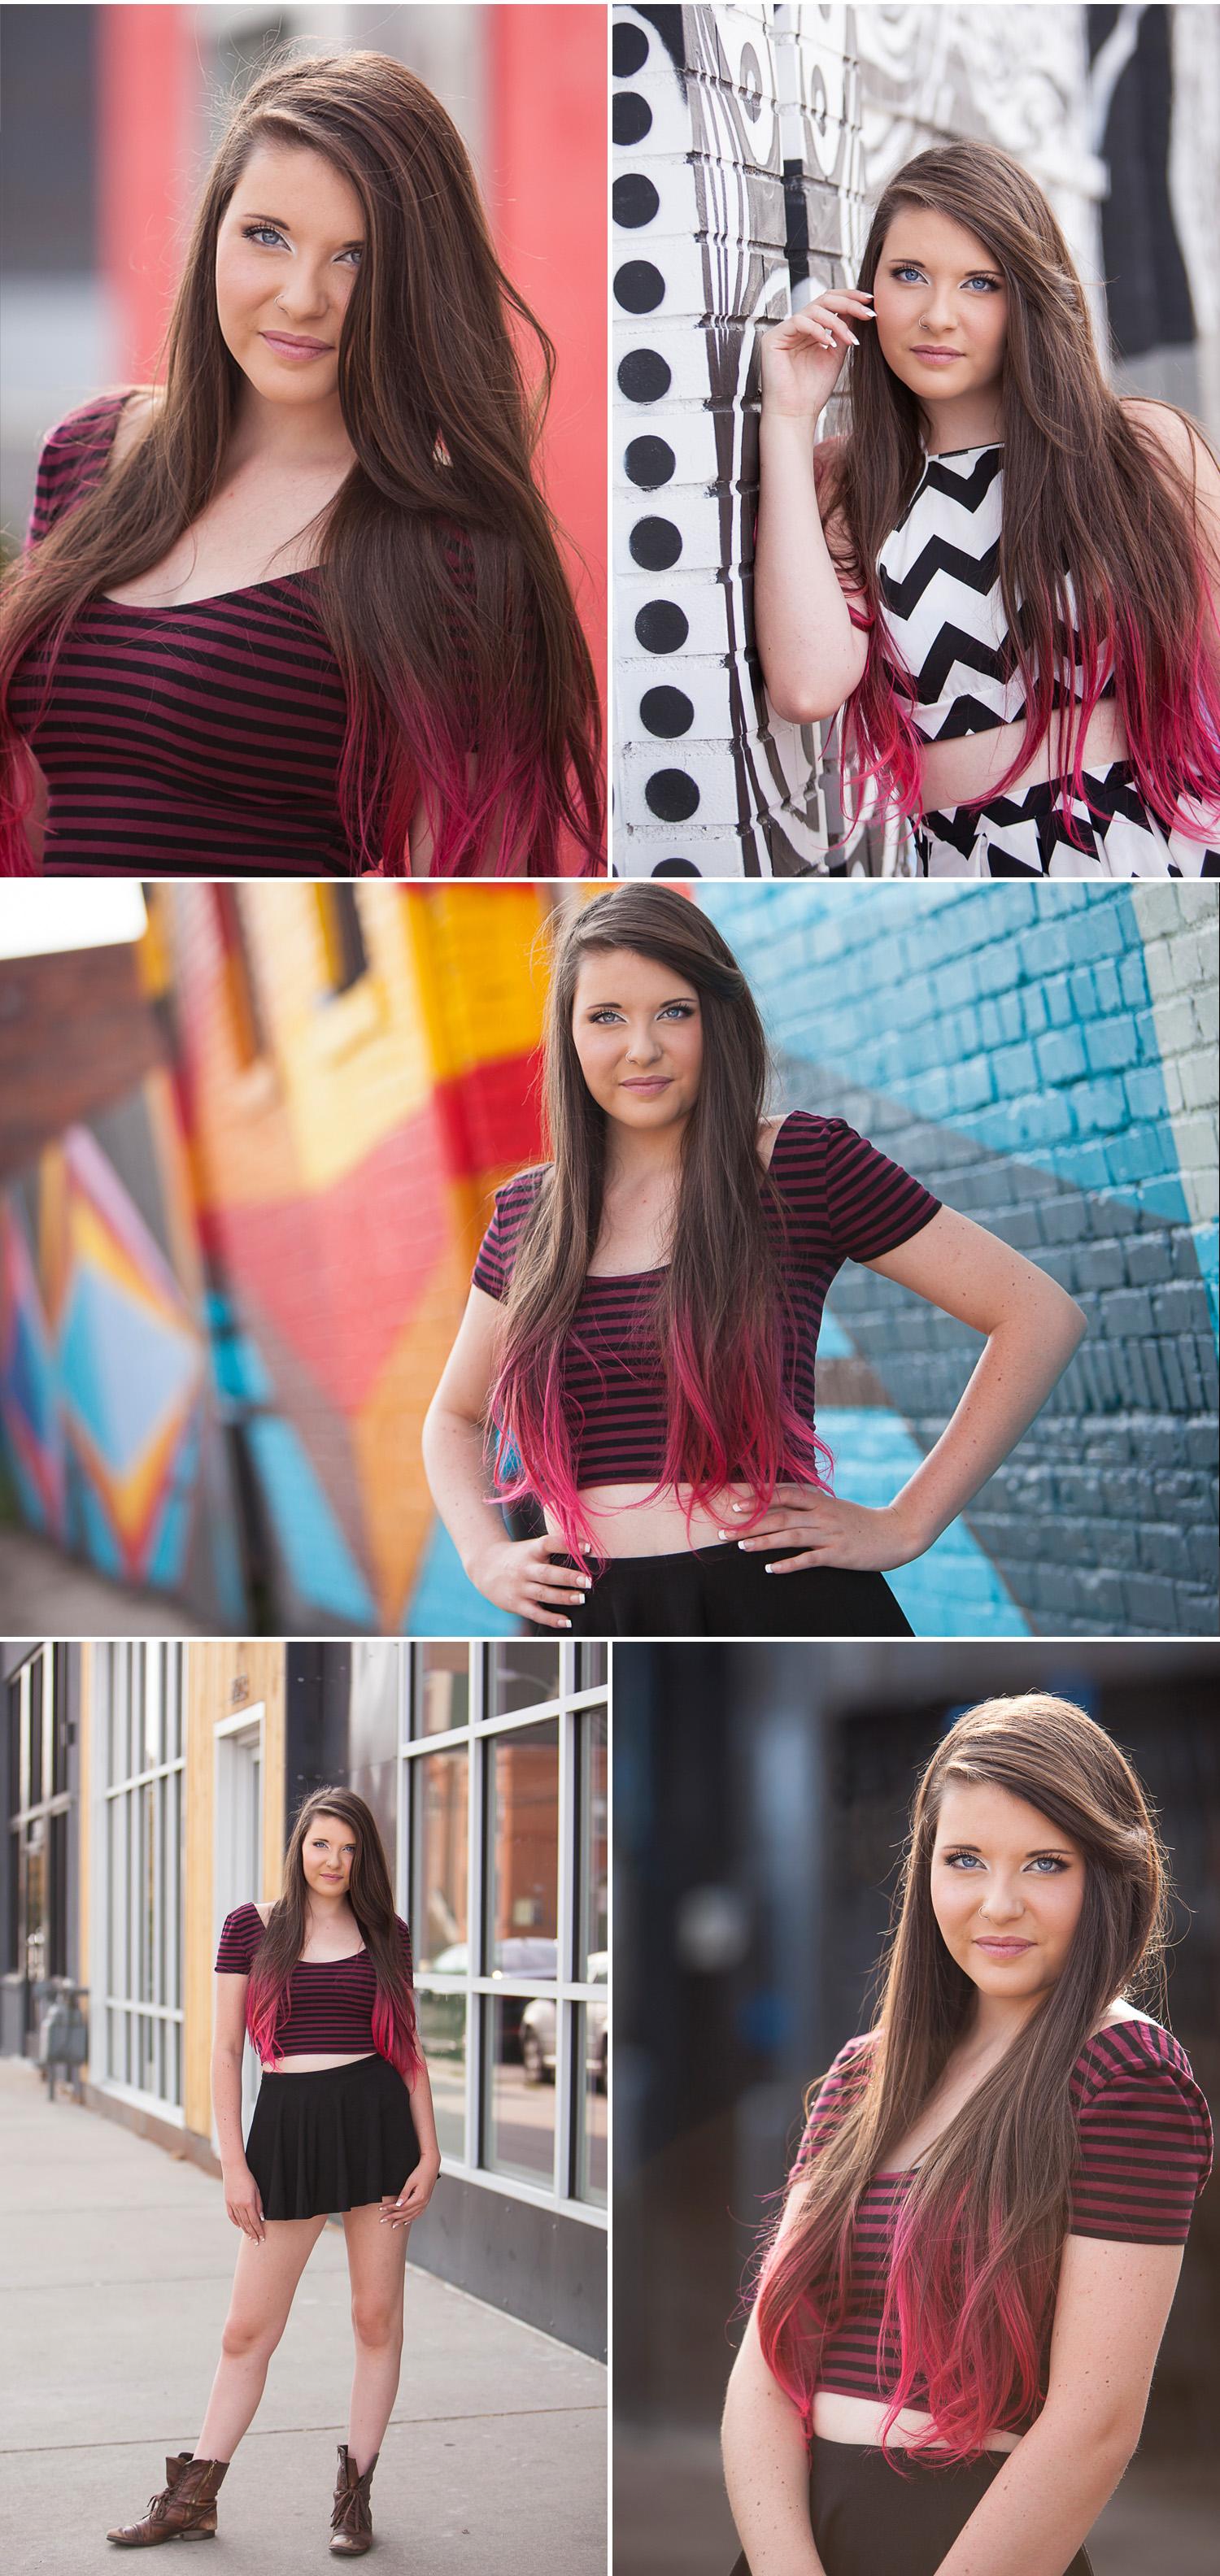 Senior Pictures in Denver with Graffiti